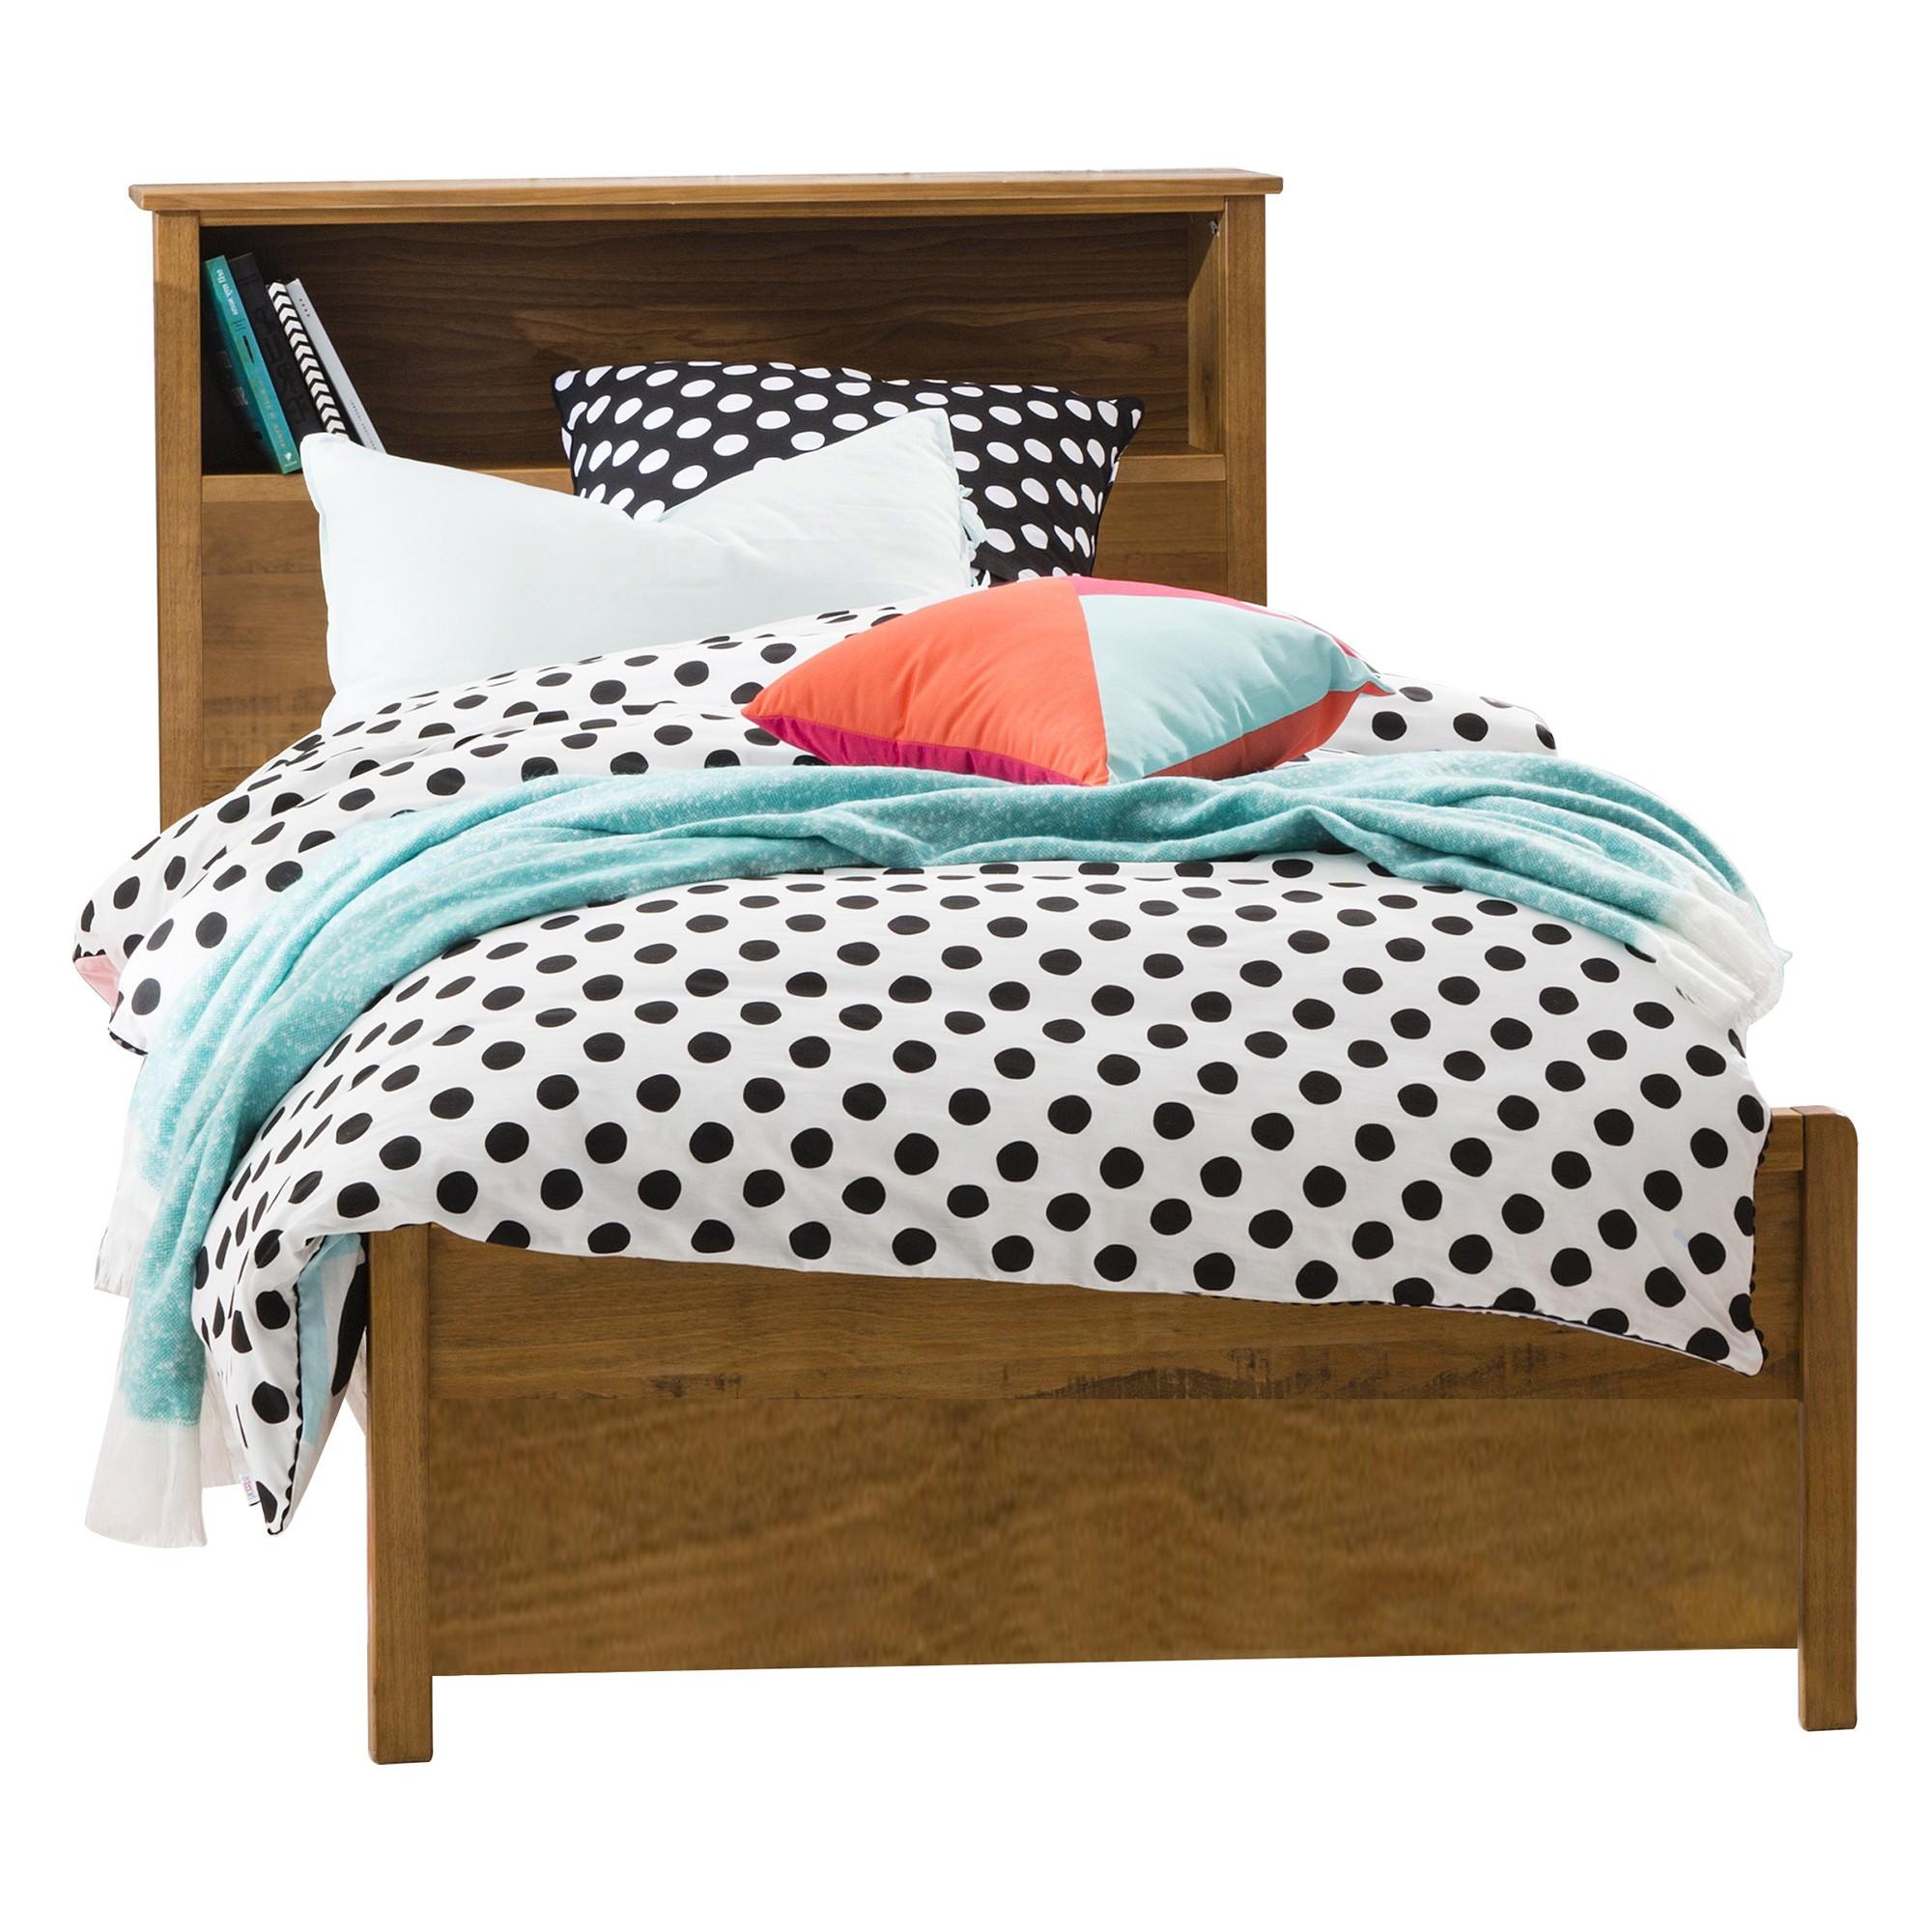 Flinders Timber Bookend Bed, Single, Natural